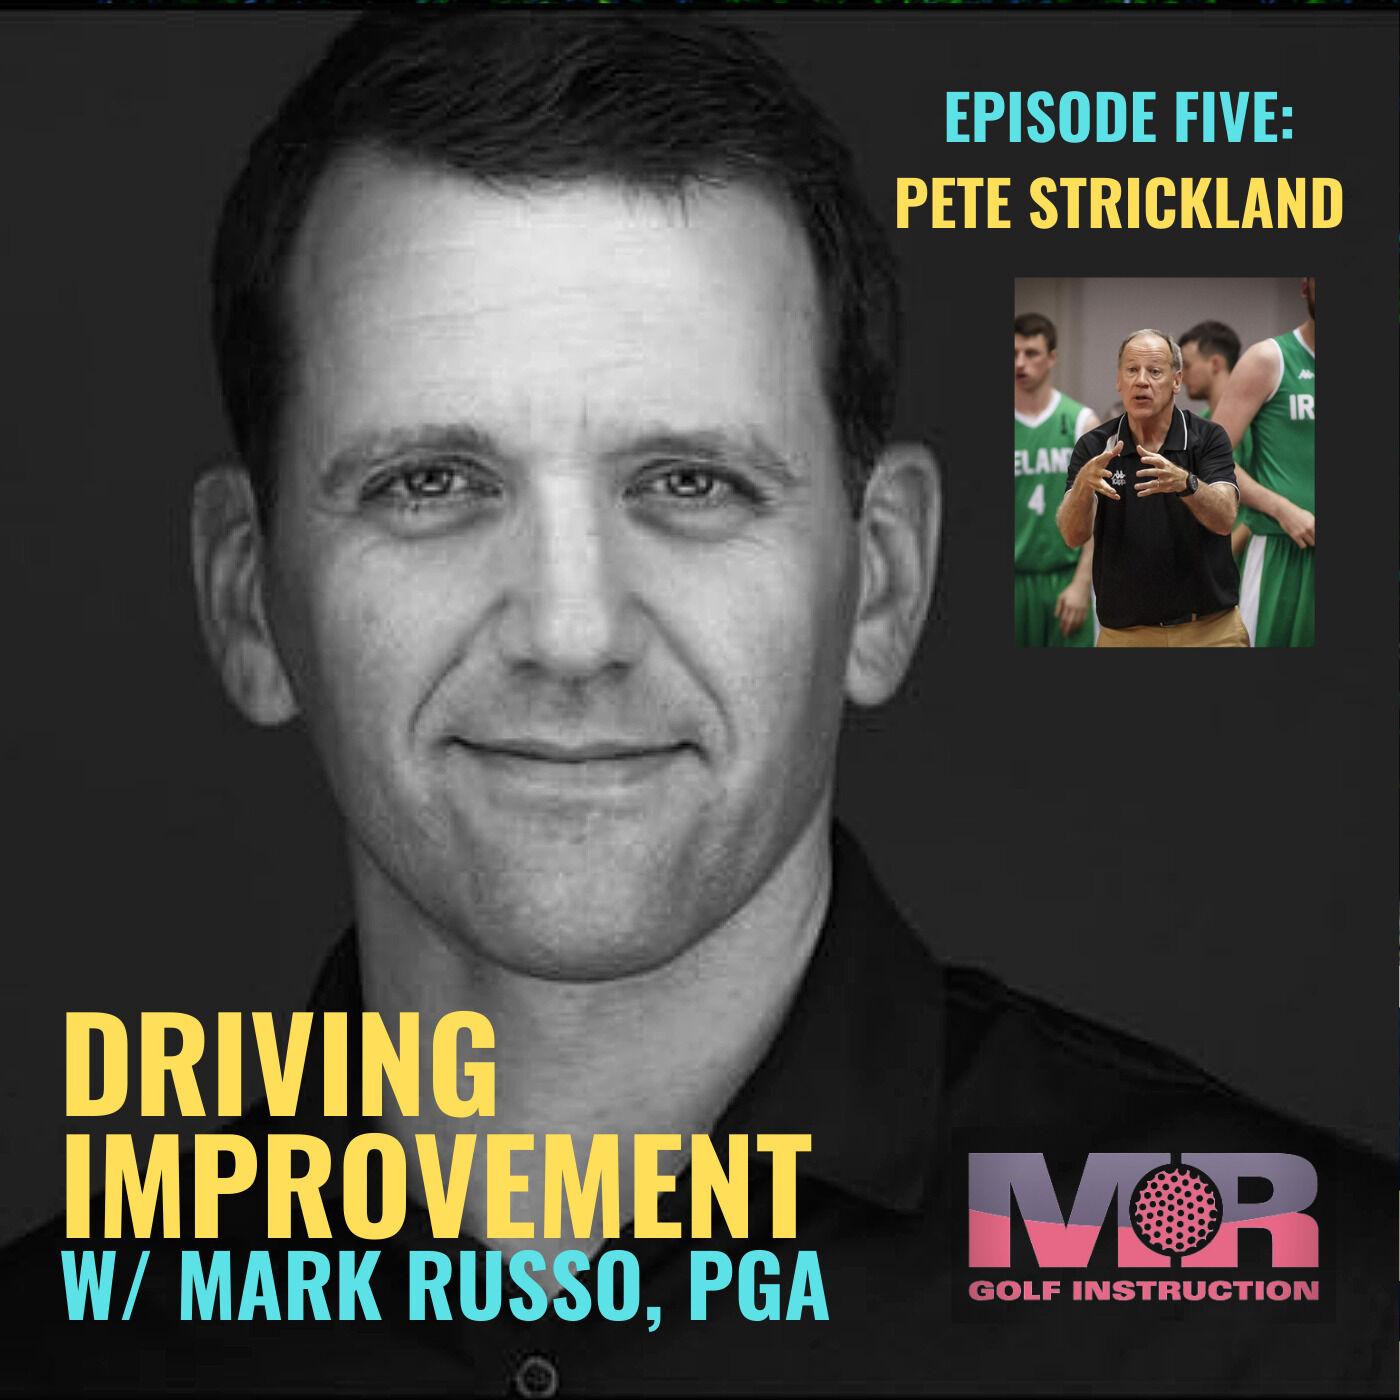 EPISODE FIVE: Pete Strickland / No Standing Still